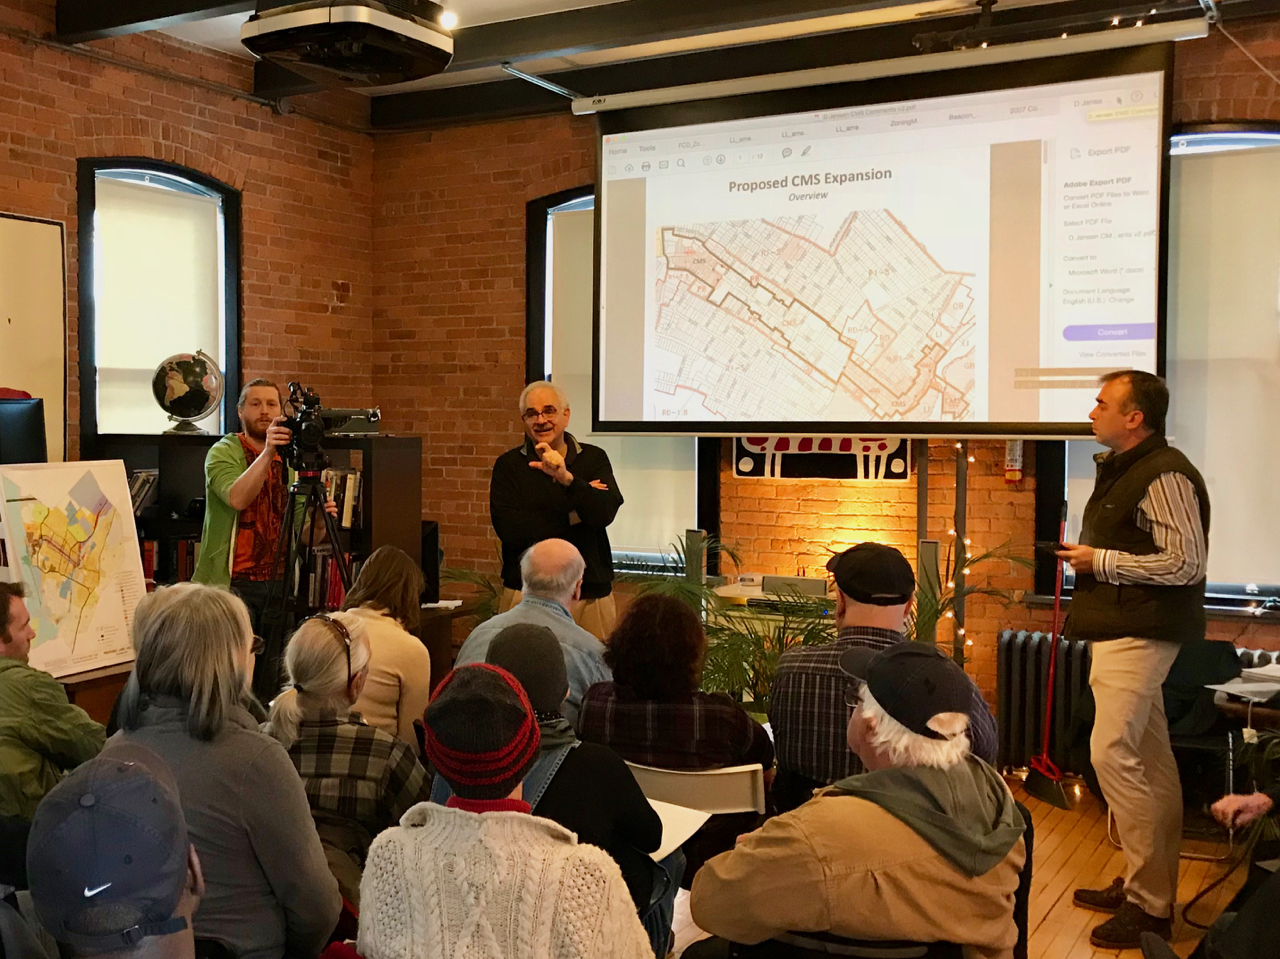 Lee Kyriacou and David Jensen presenting